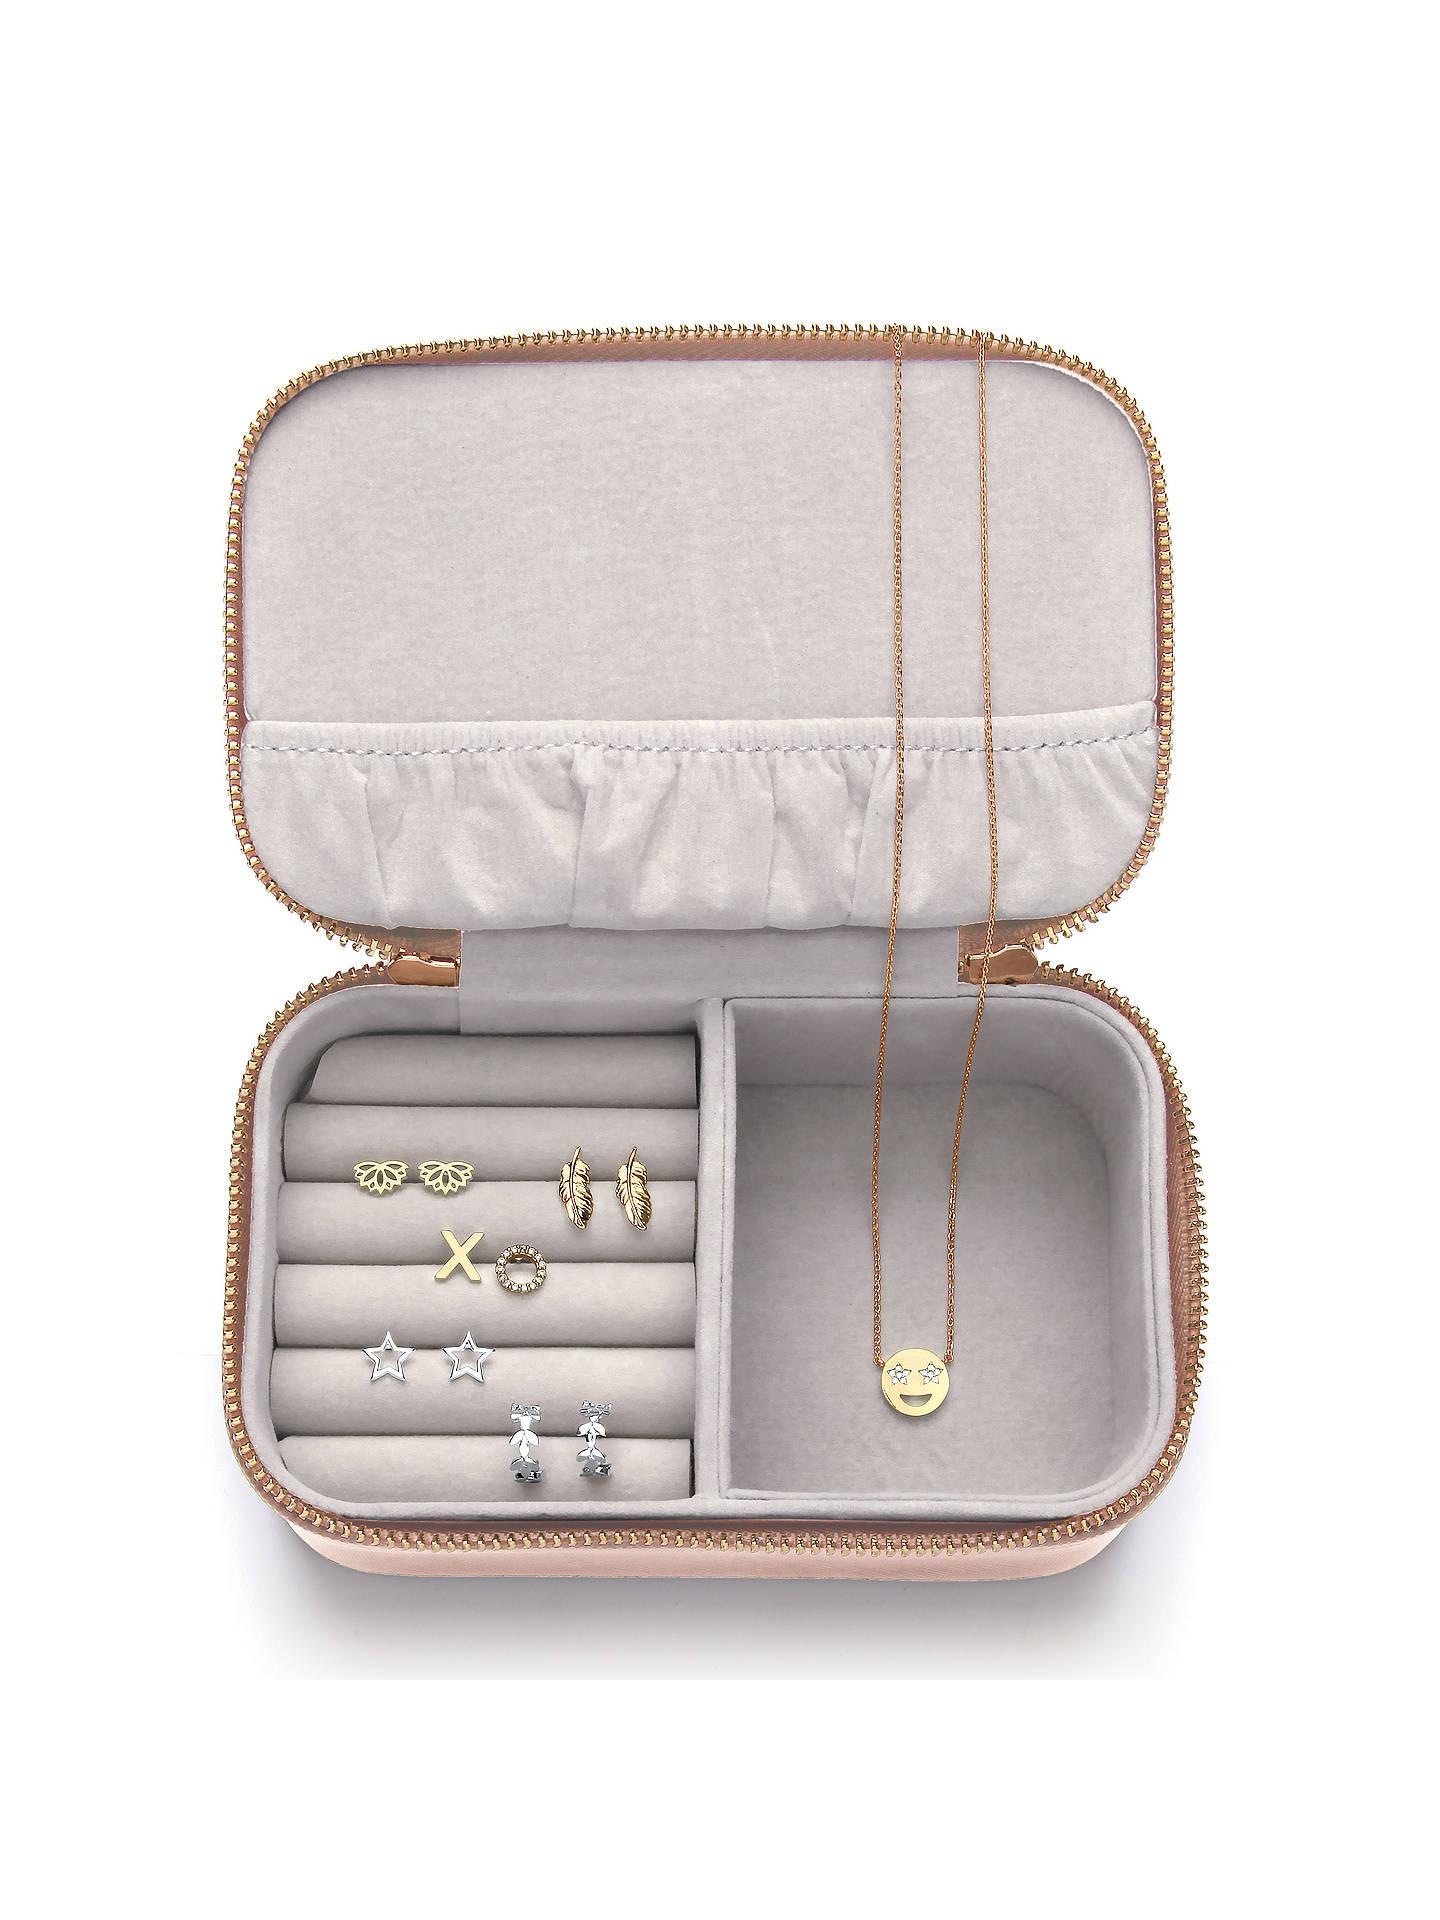 Estella Bartlett Treasure Me Zipped Jewellery Box Blush